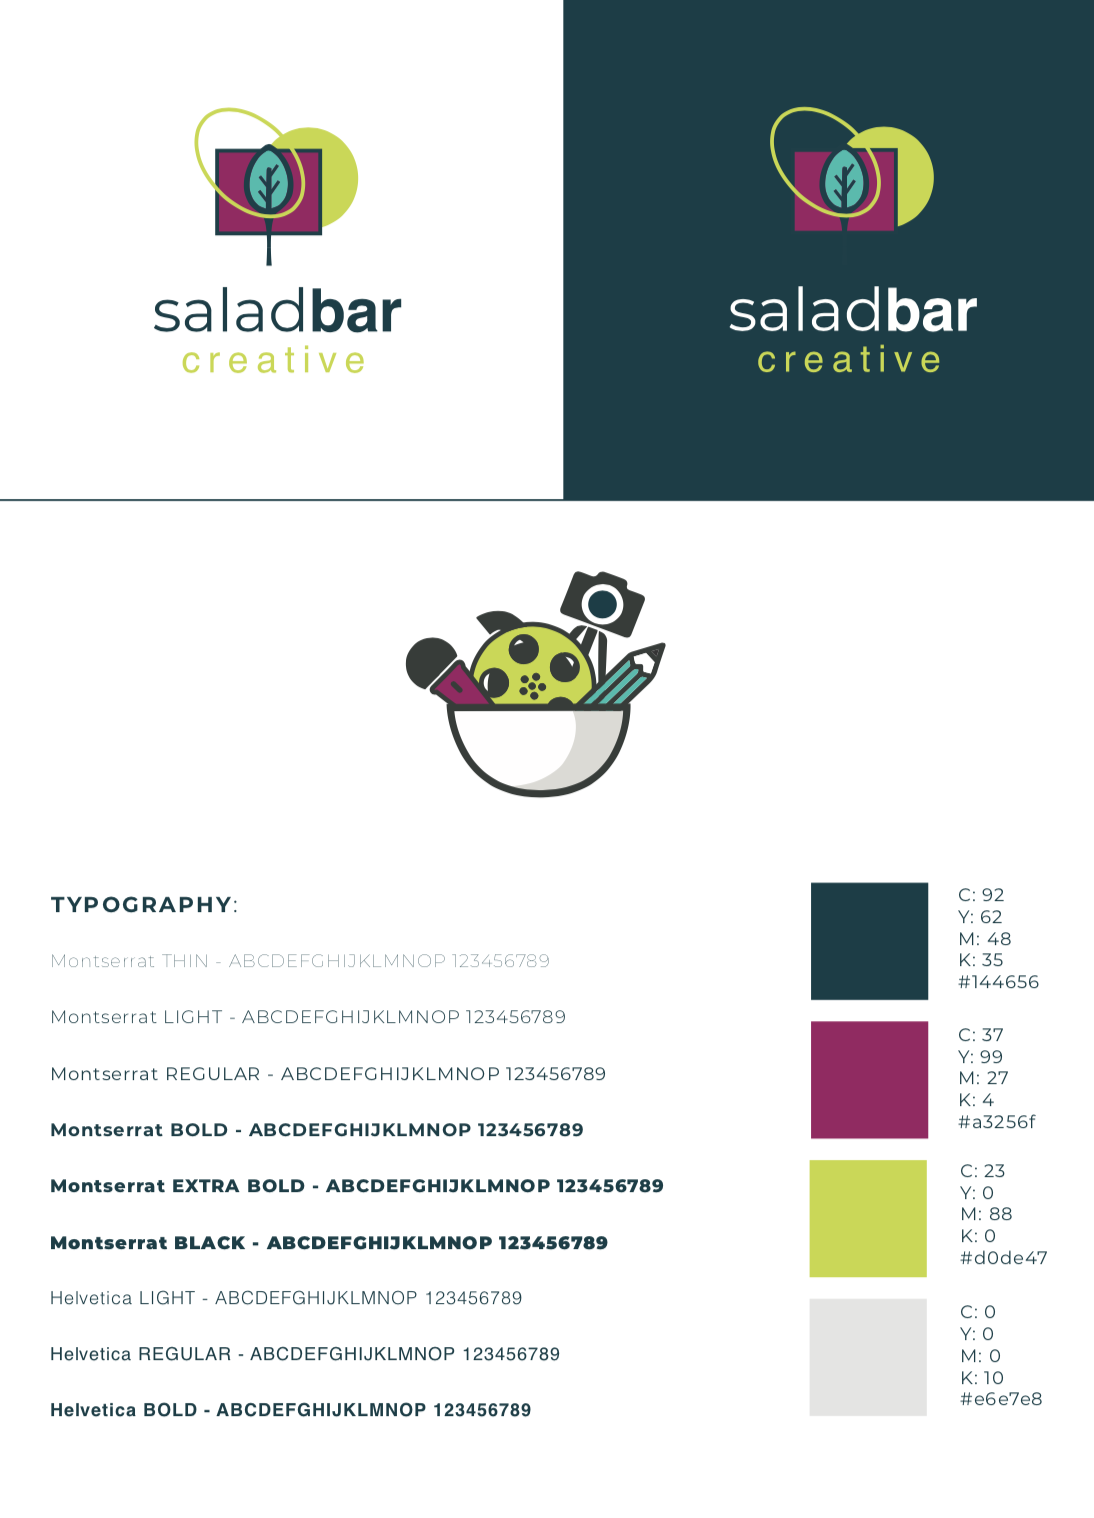 SaladBar Brand Guide